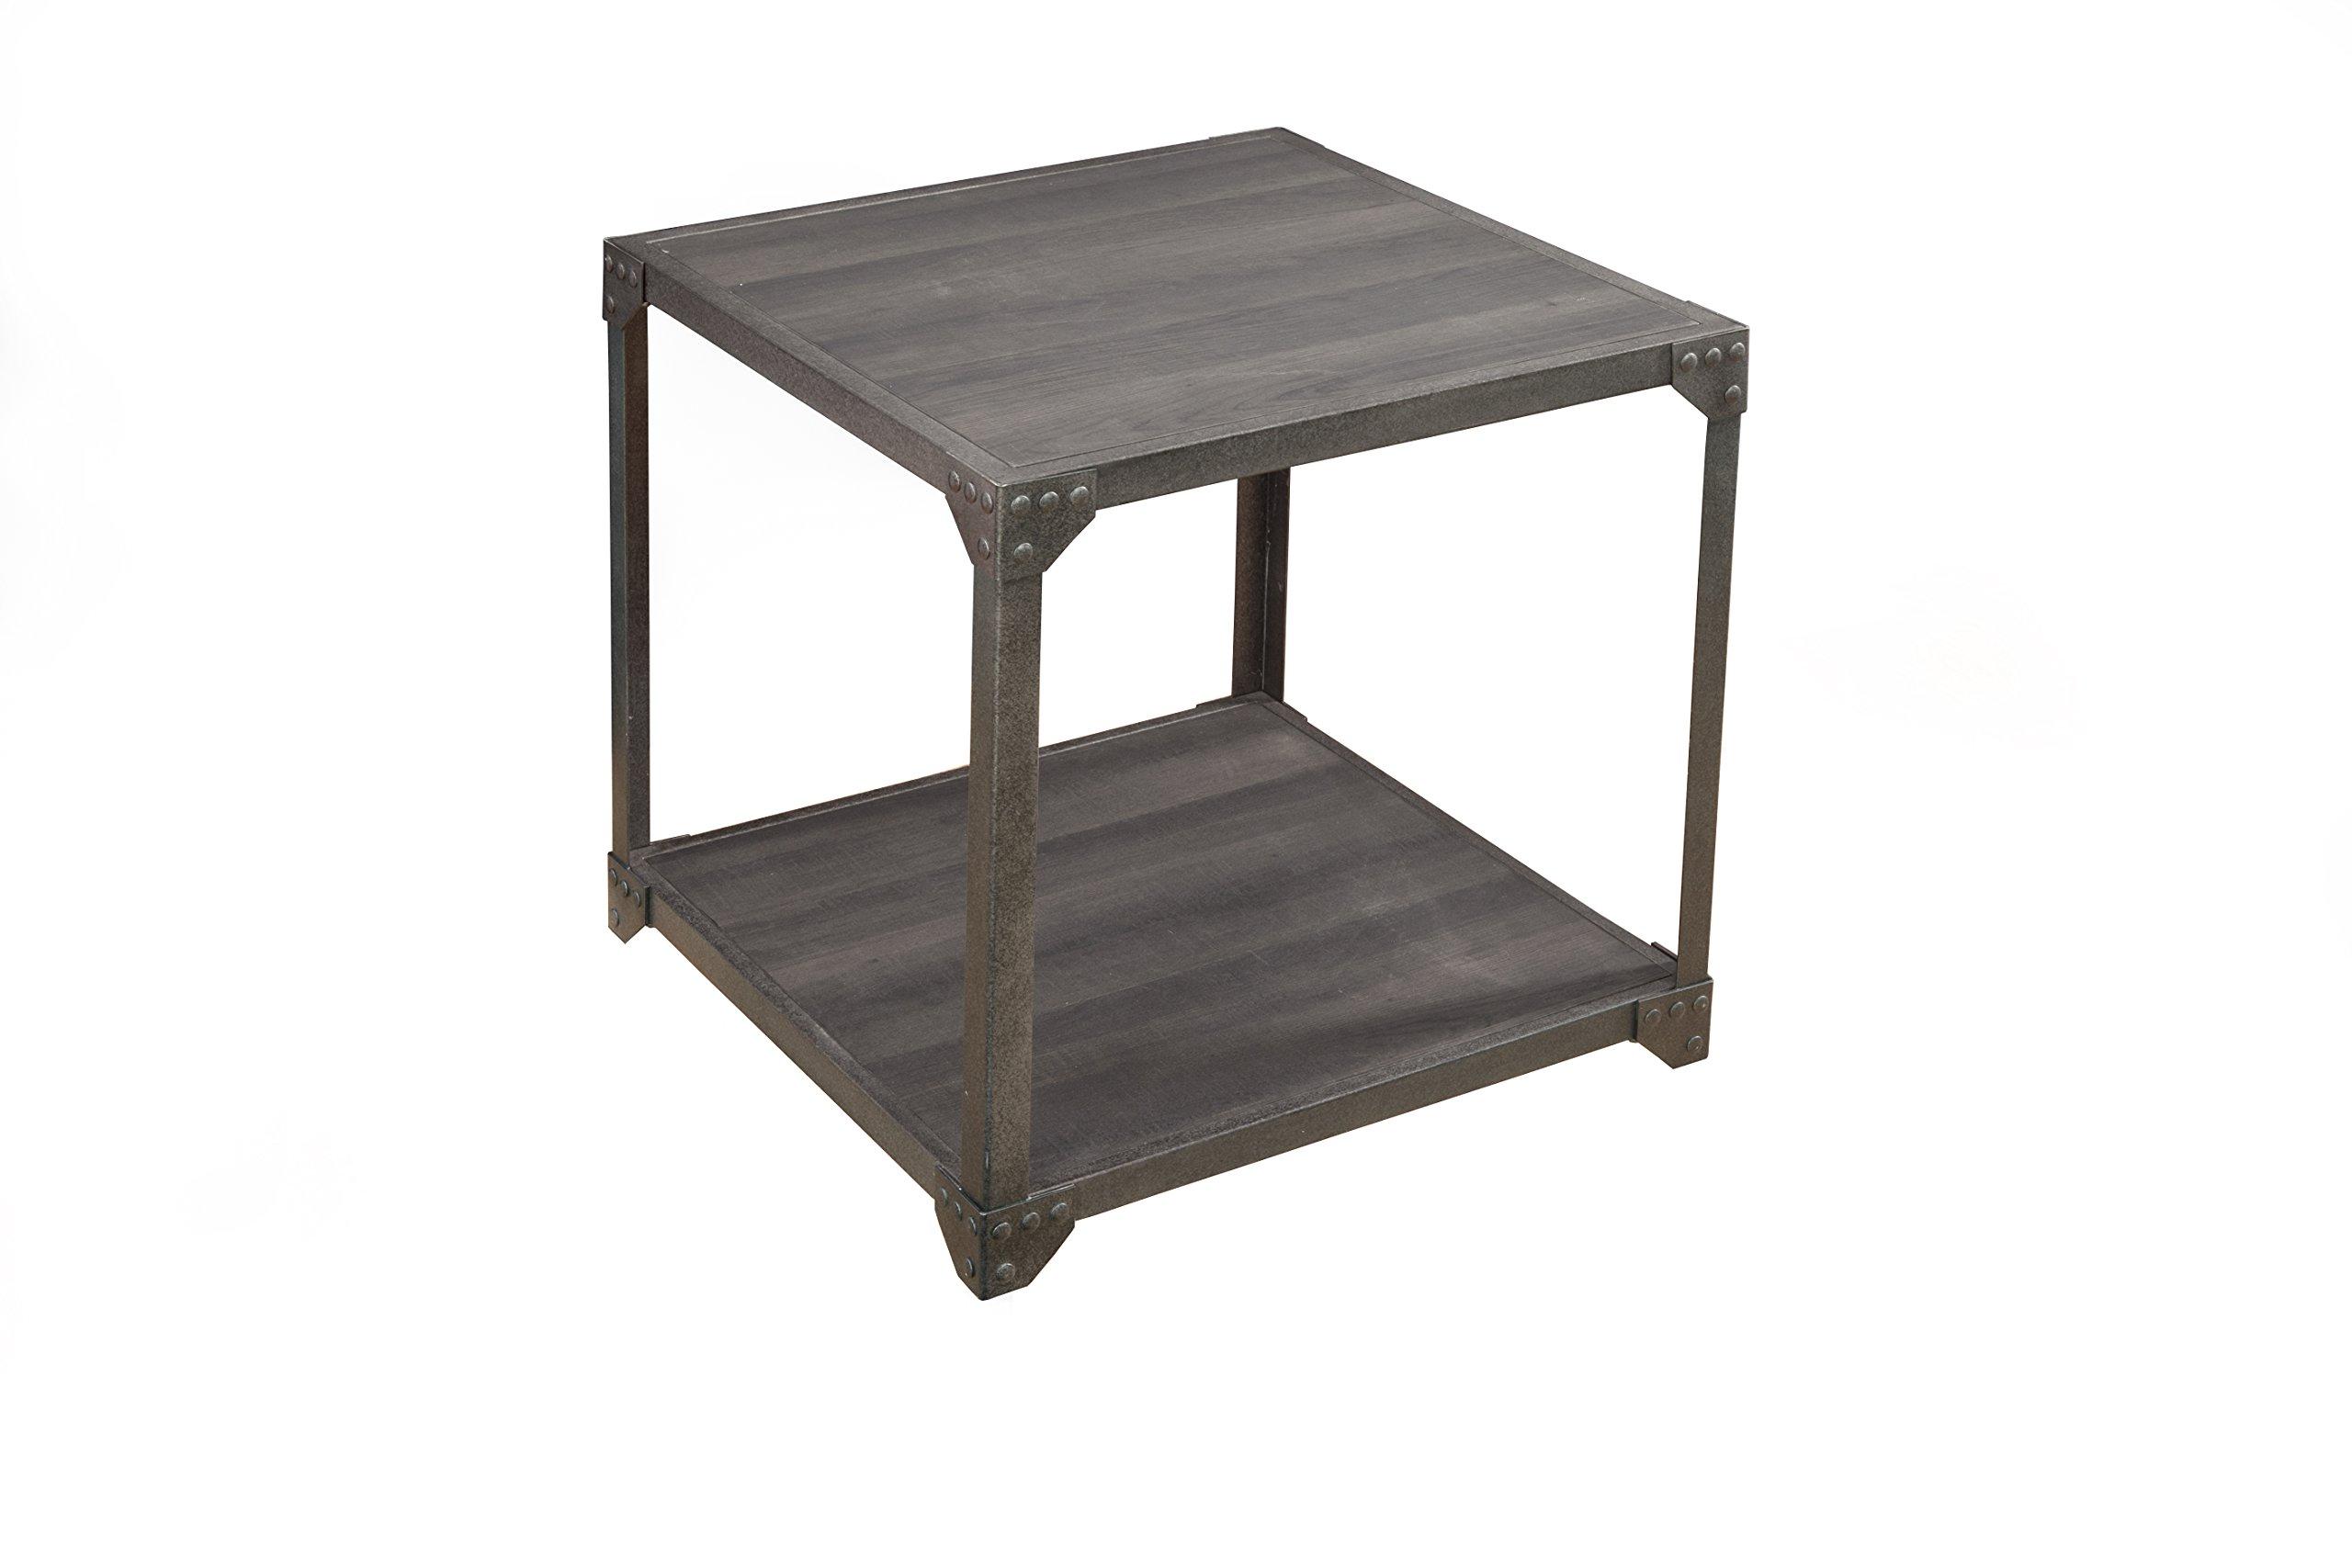 Martin Svensson Home 860131 Arts District Loft End Table, Charred Oak